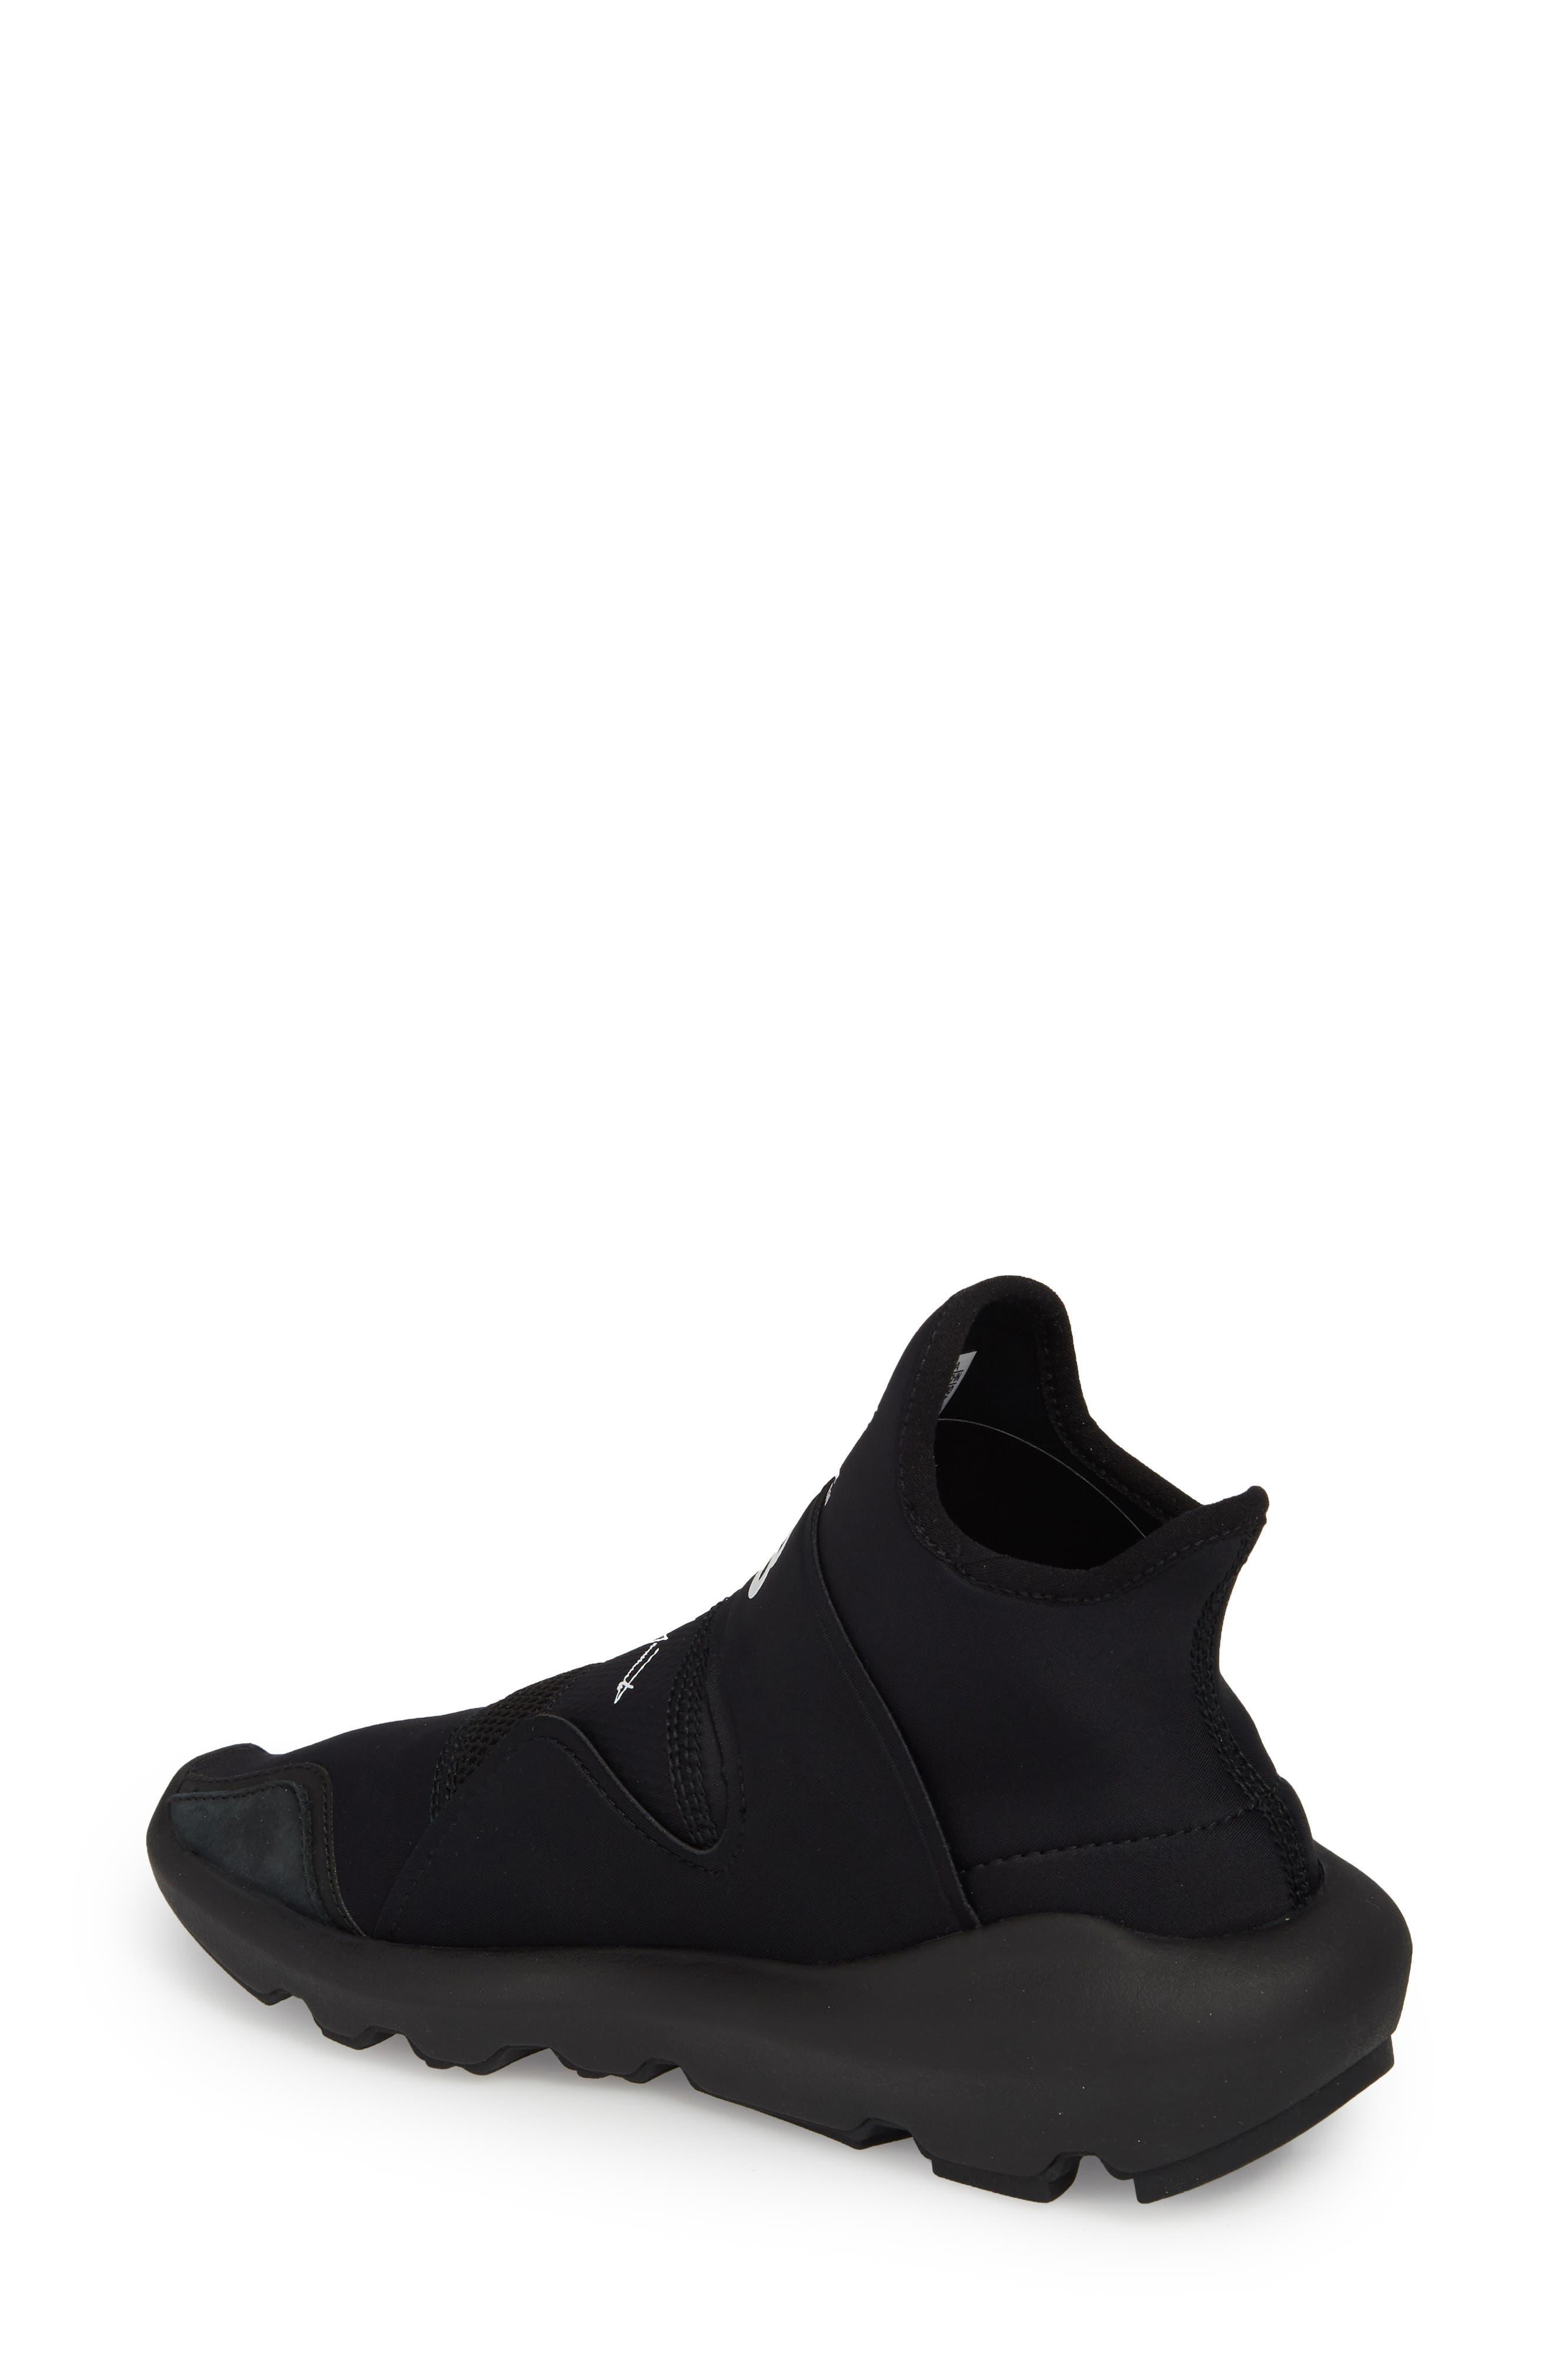 Superbou Sneaker,                             Alternate thumbnail 2, color,                             Black / Core White